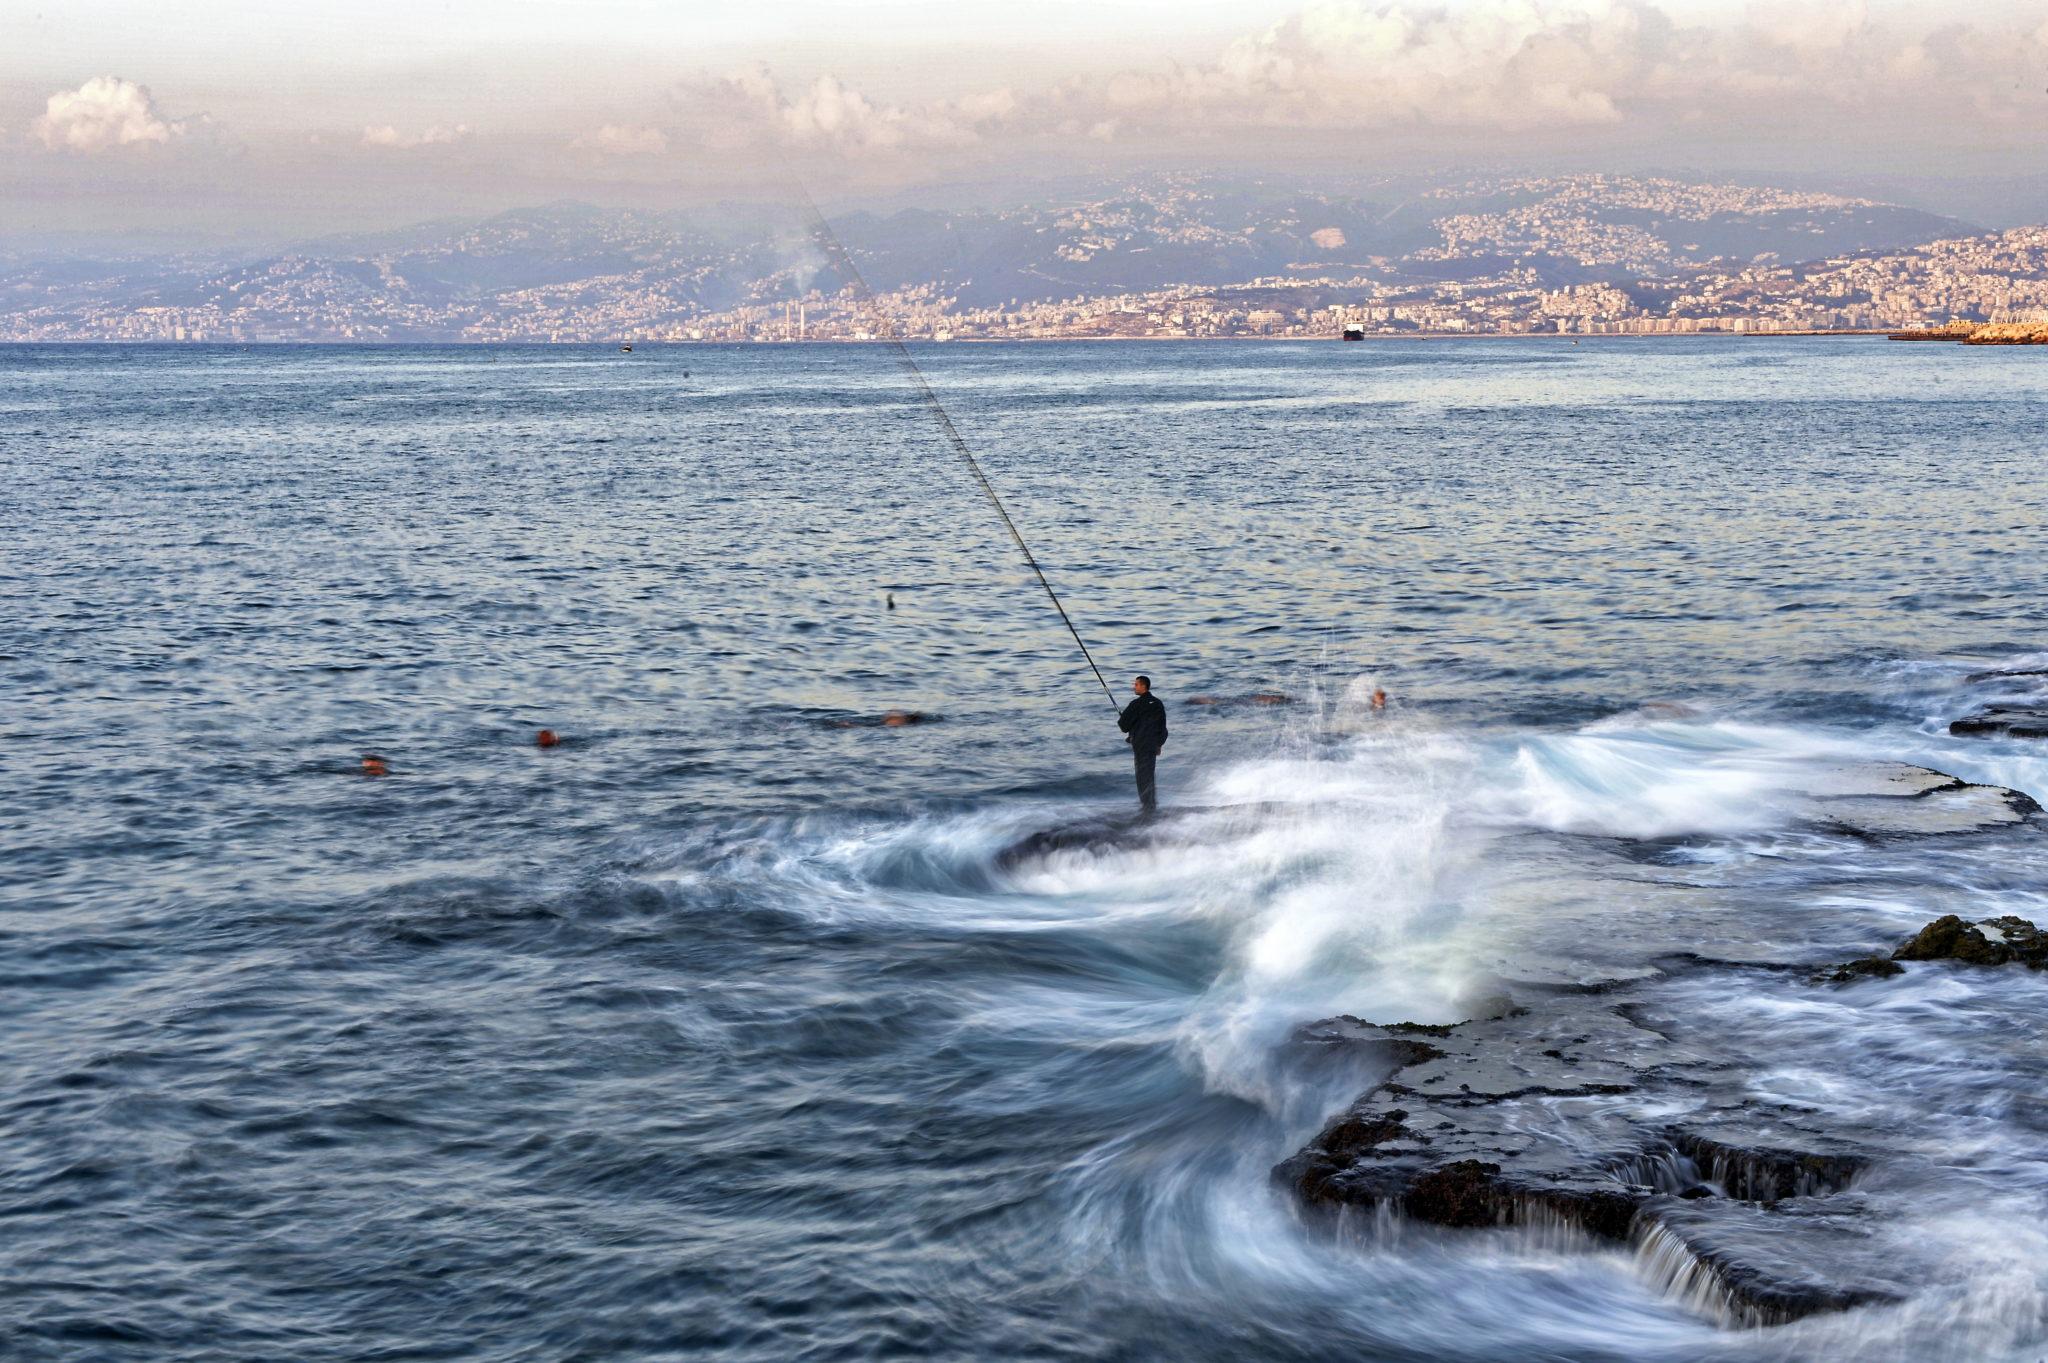 Bejrut, Liban: mężczyzna łowi ryby, fot. WAEL HAMZEH , PAp/EPA